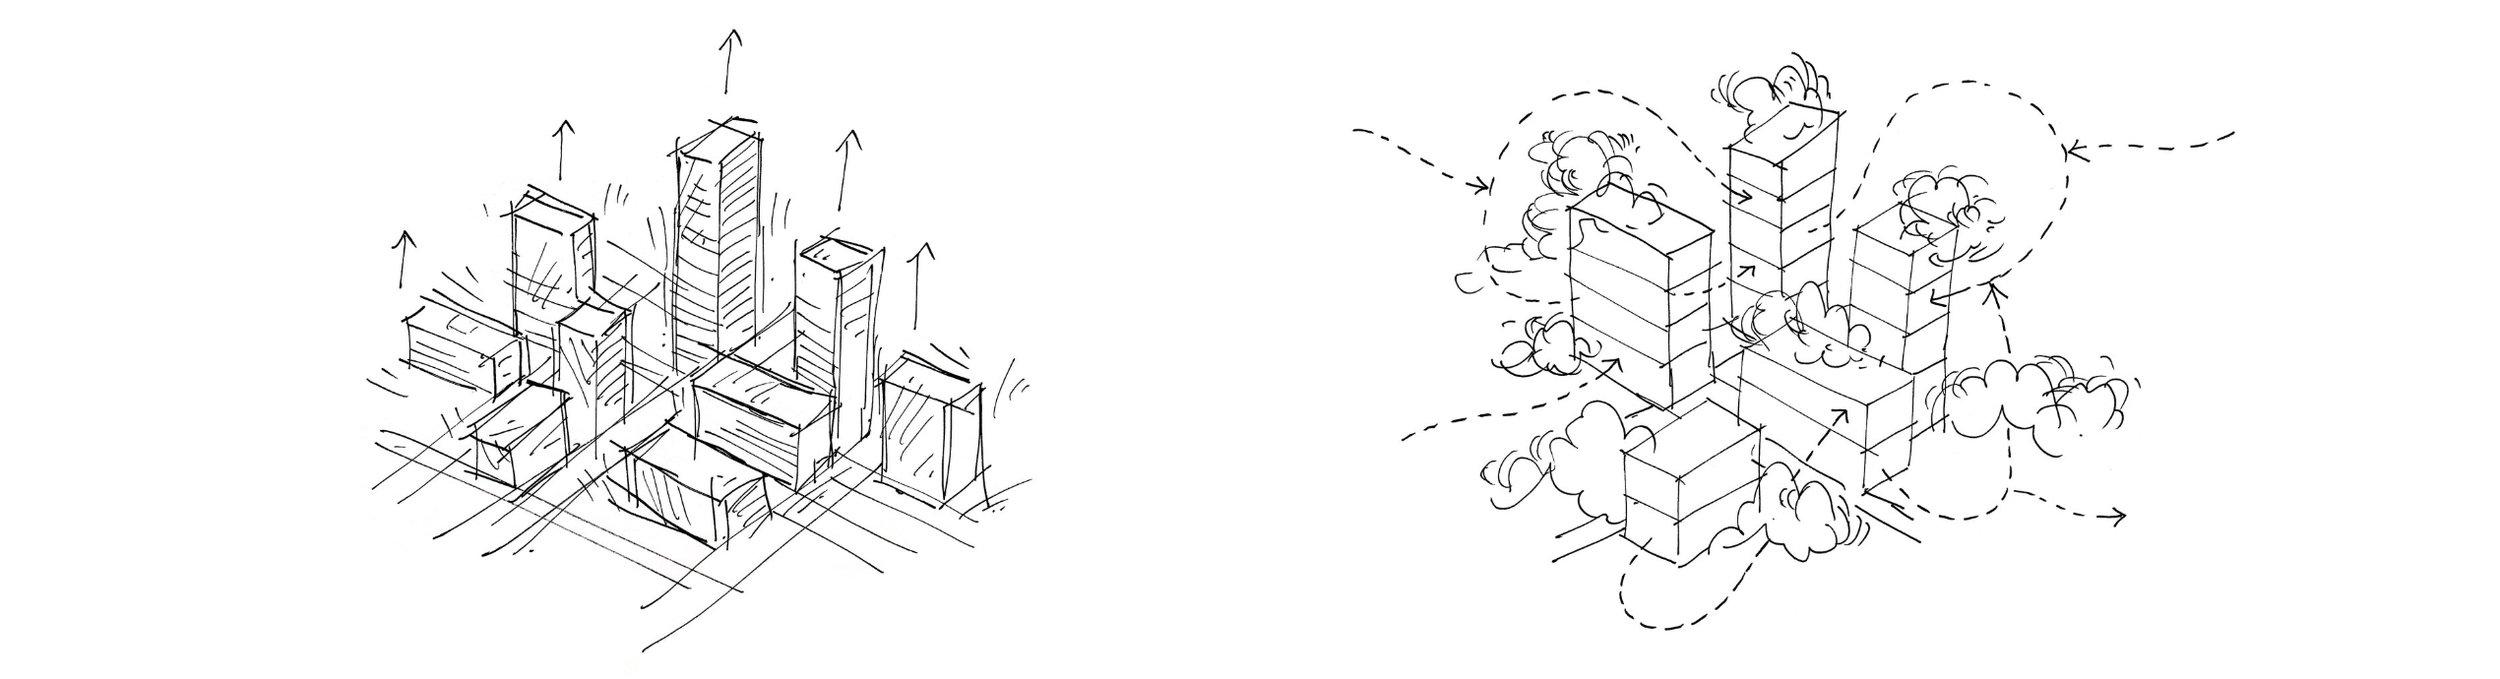 Cutwork, Elevator vs Laptop, 6B.jpg